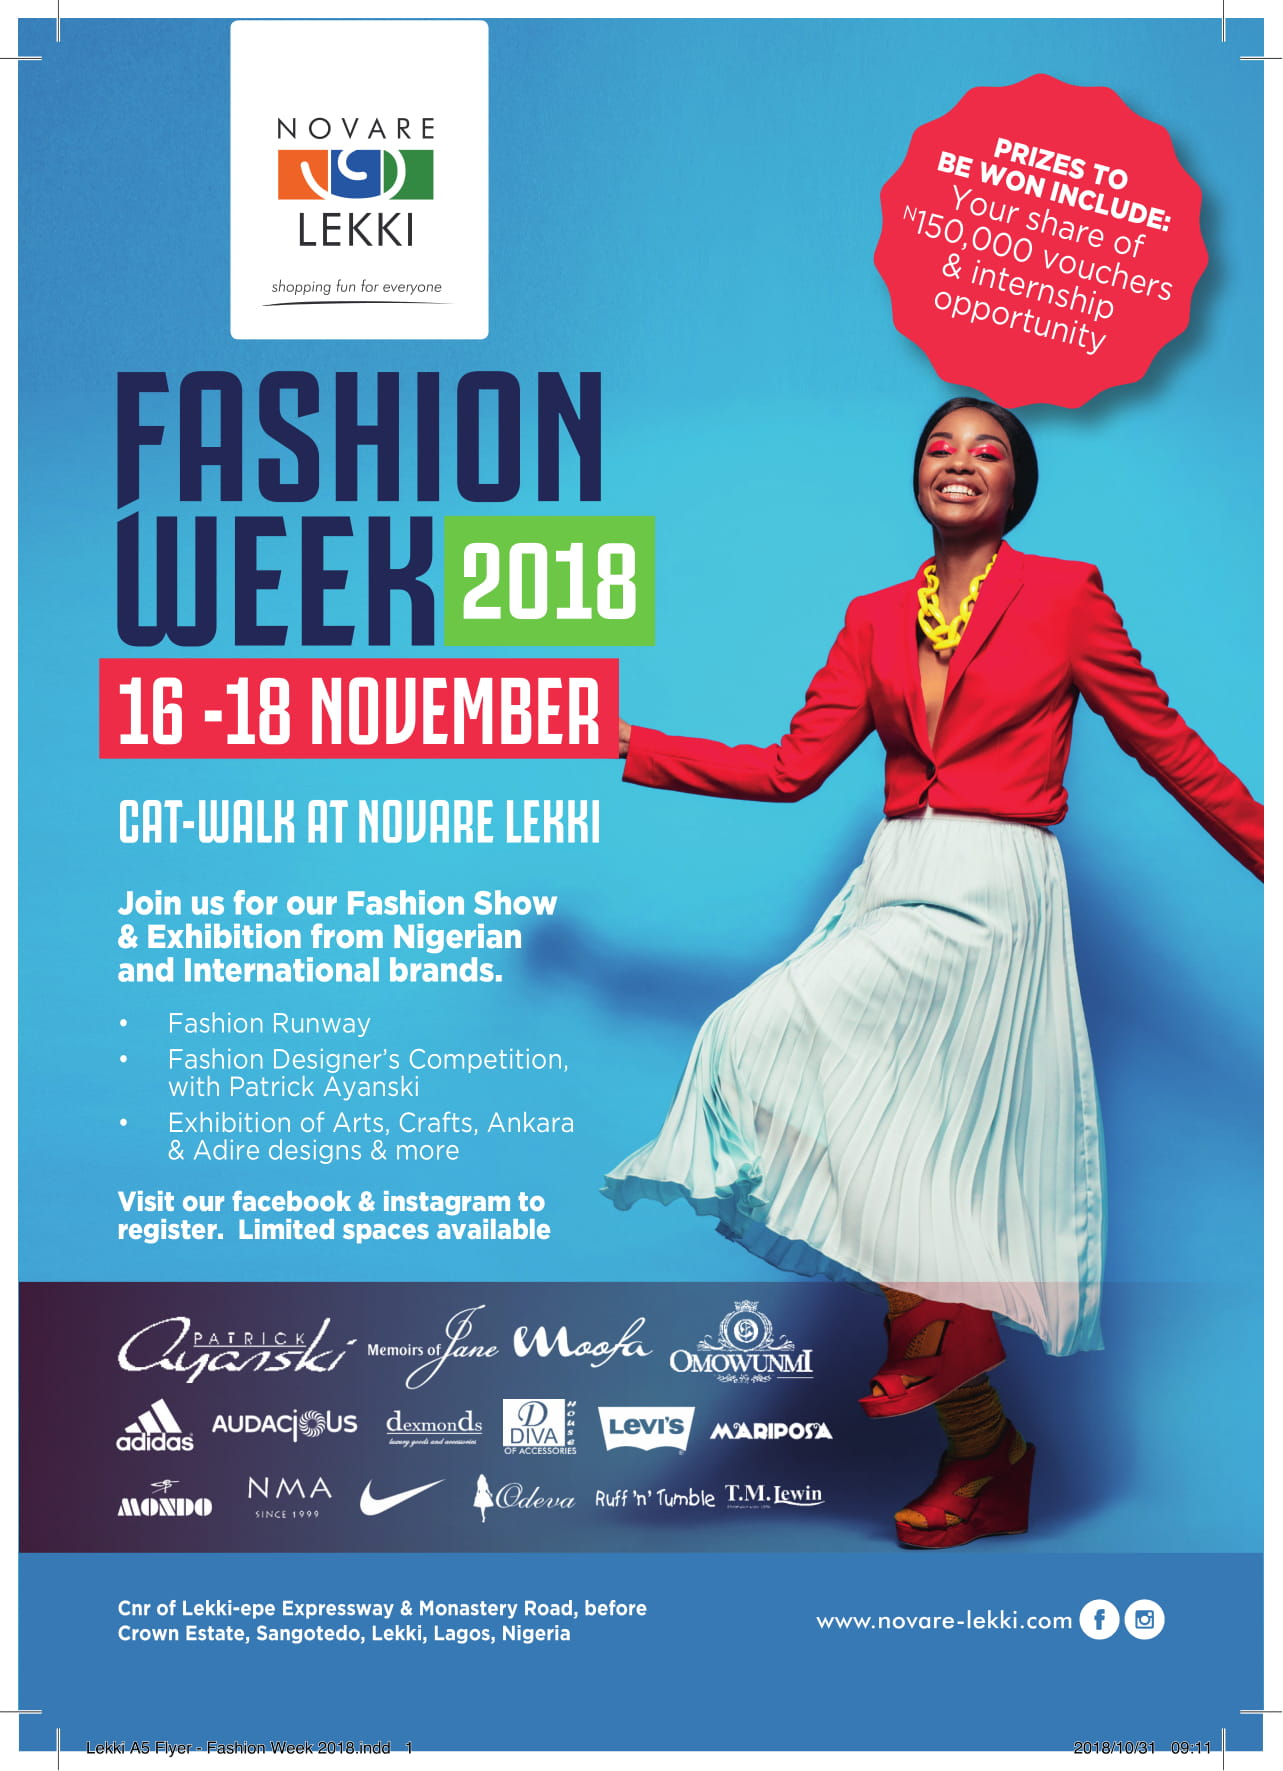 Enjoy 3 Days Exhibition Of African Art Craft Fashion Runway Show At Novare Lekki Fashion Week November 16th 18th Bellanaija